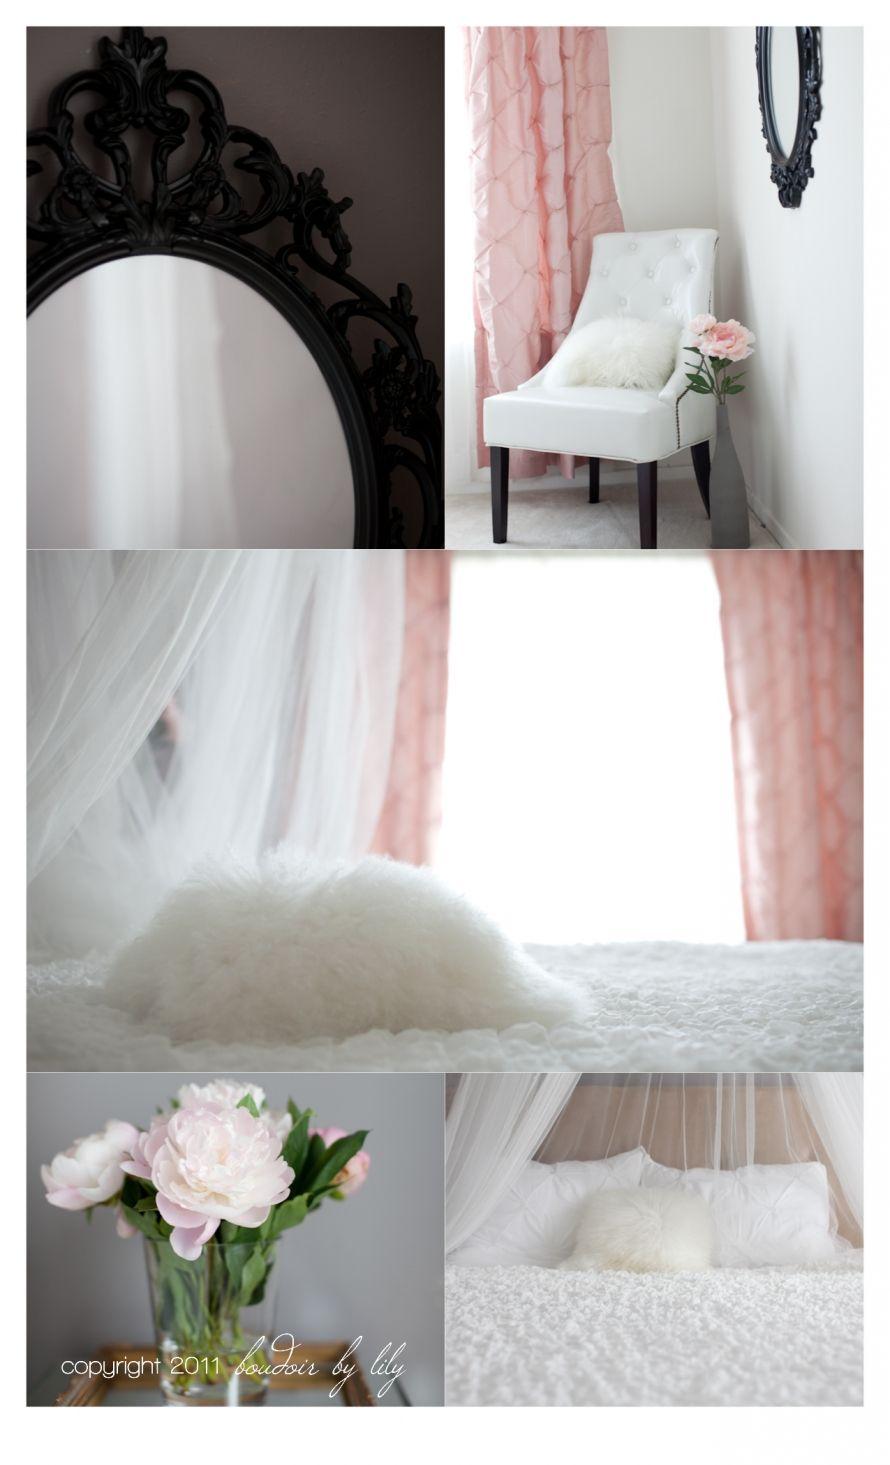 Boudoir decorations by Lily home studio | My Next Place | Pinterest ...